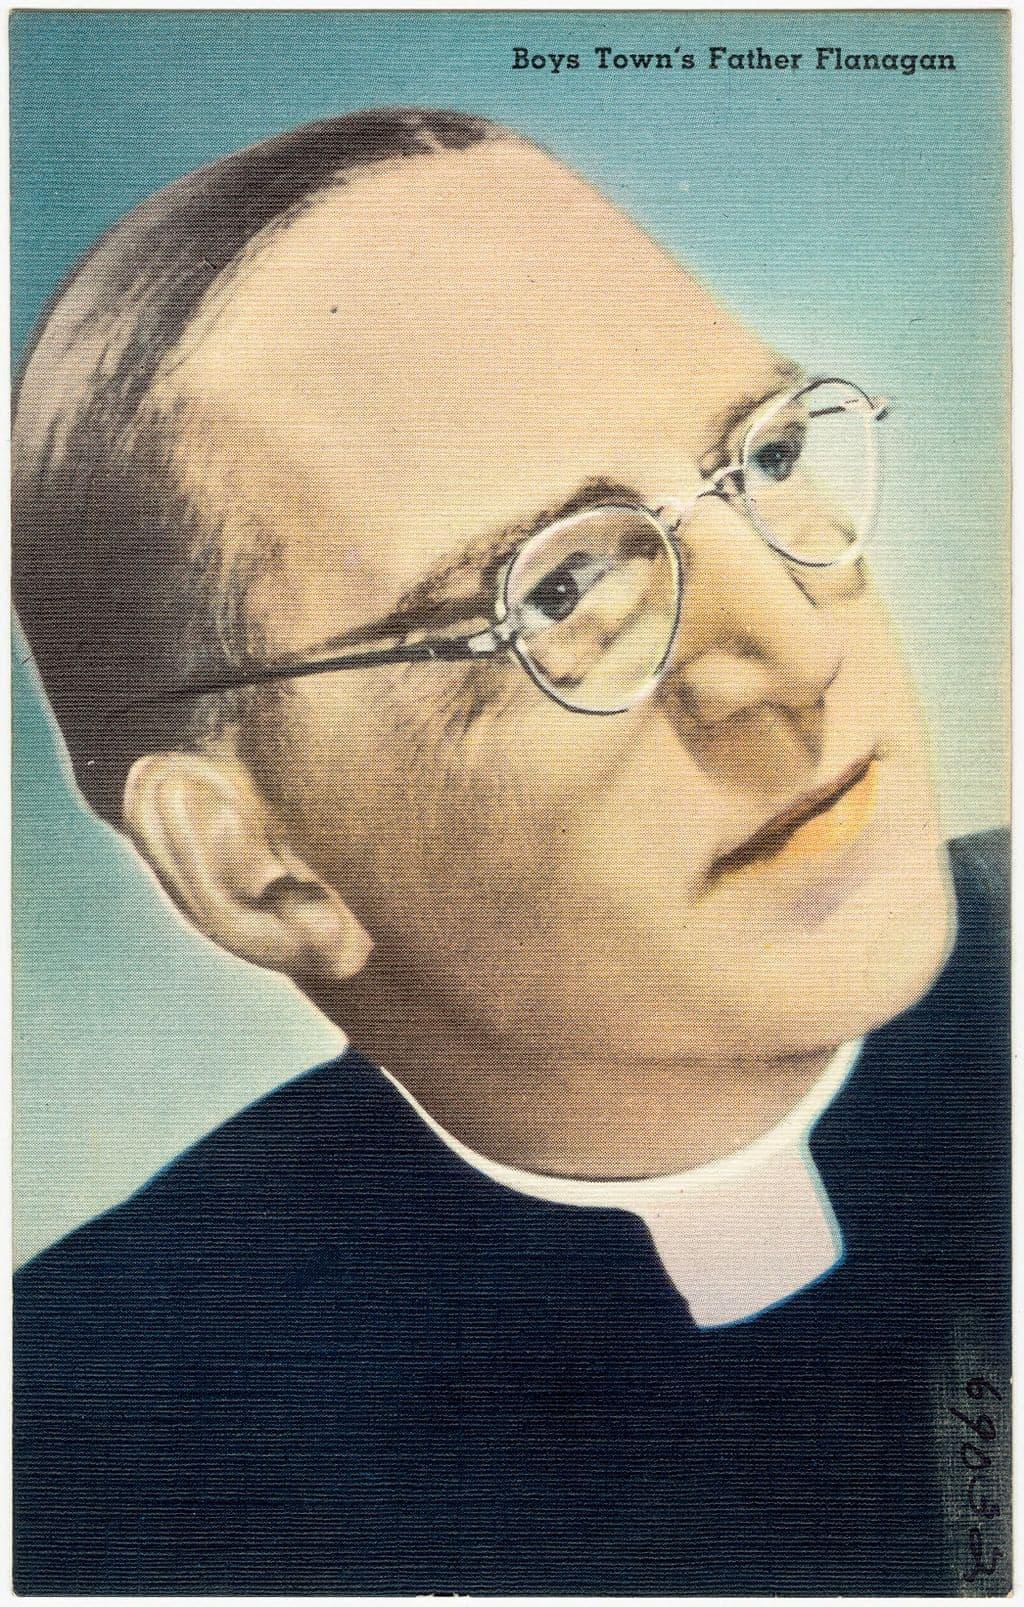 Portrait of Father Edward Flanagan of Boys Town